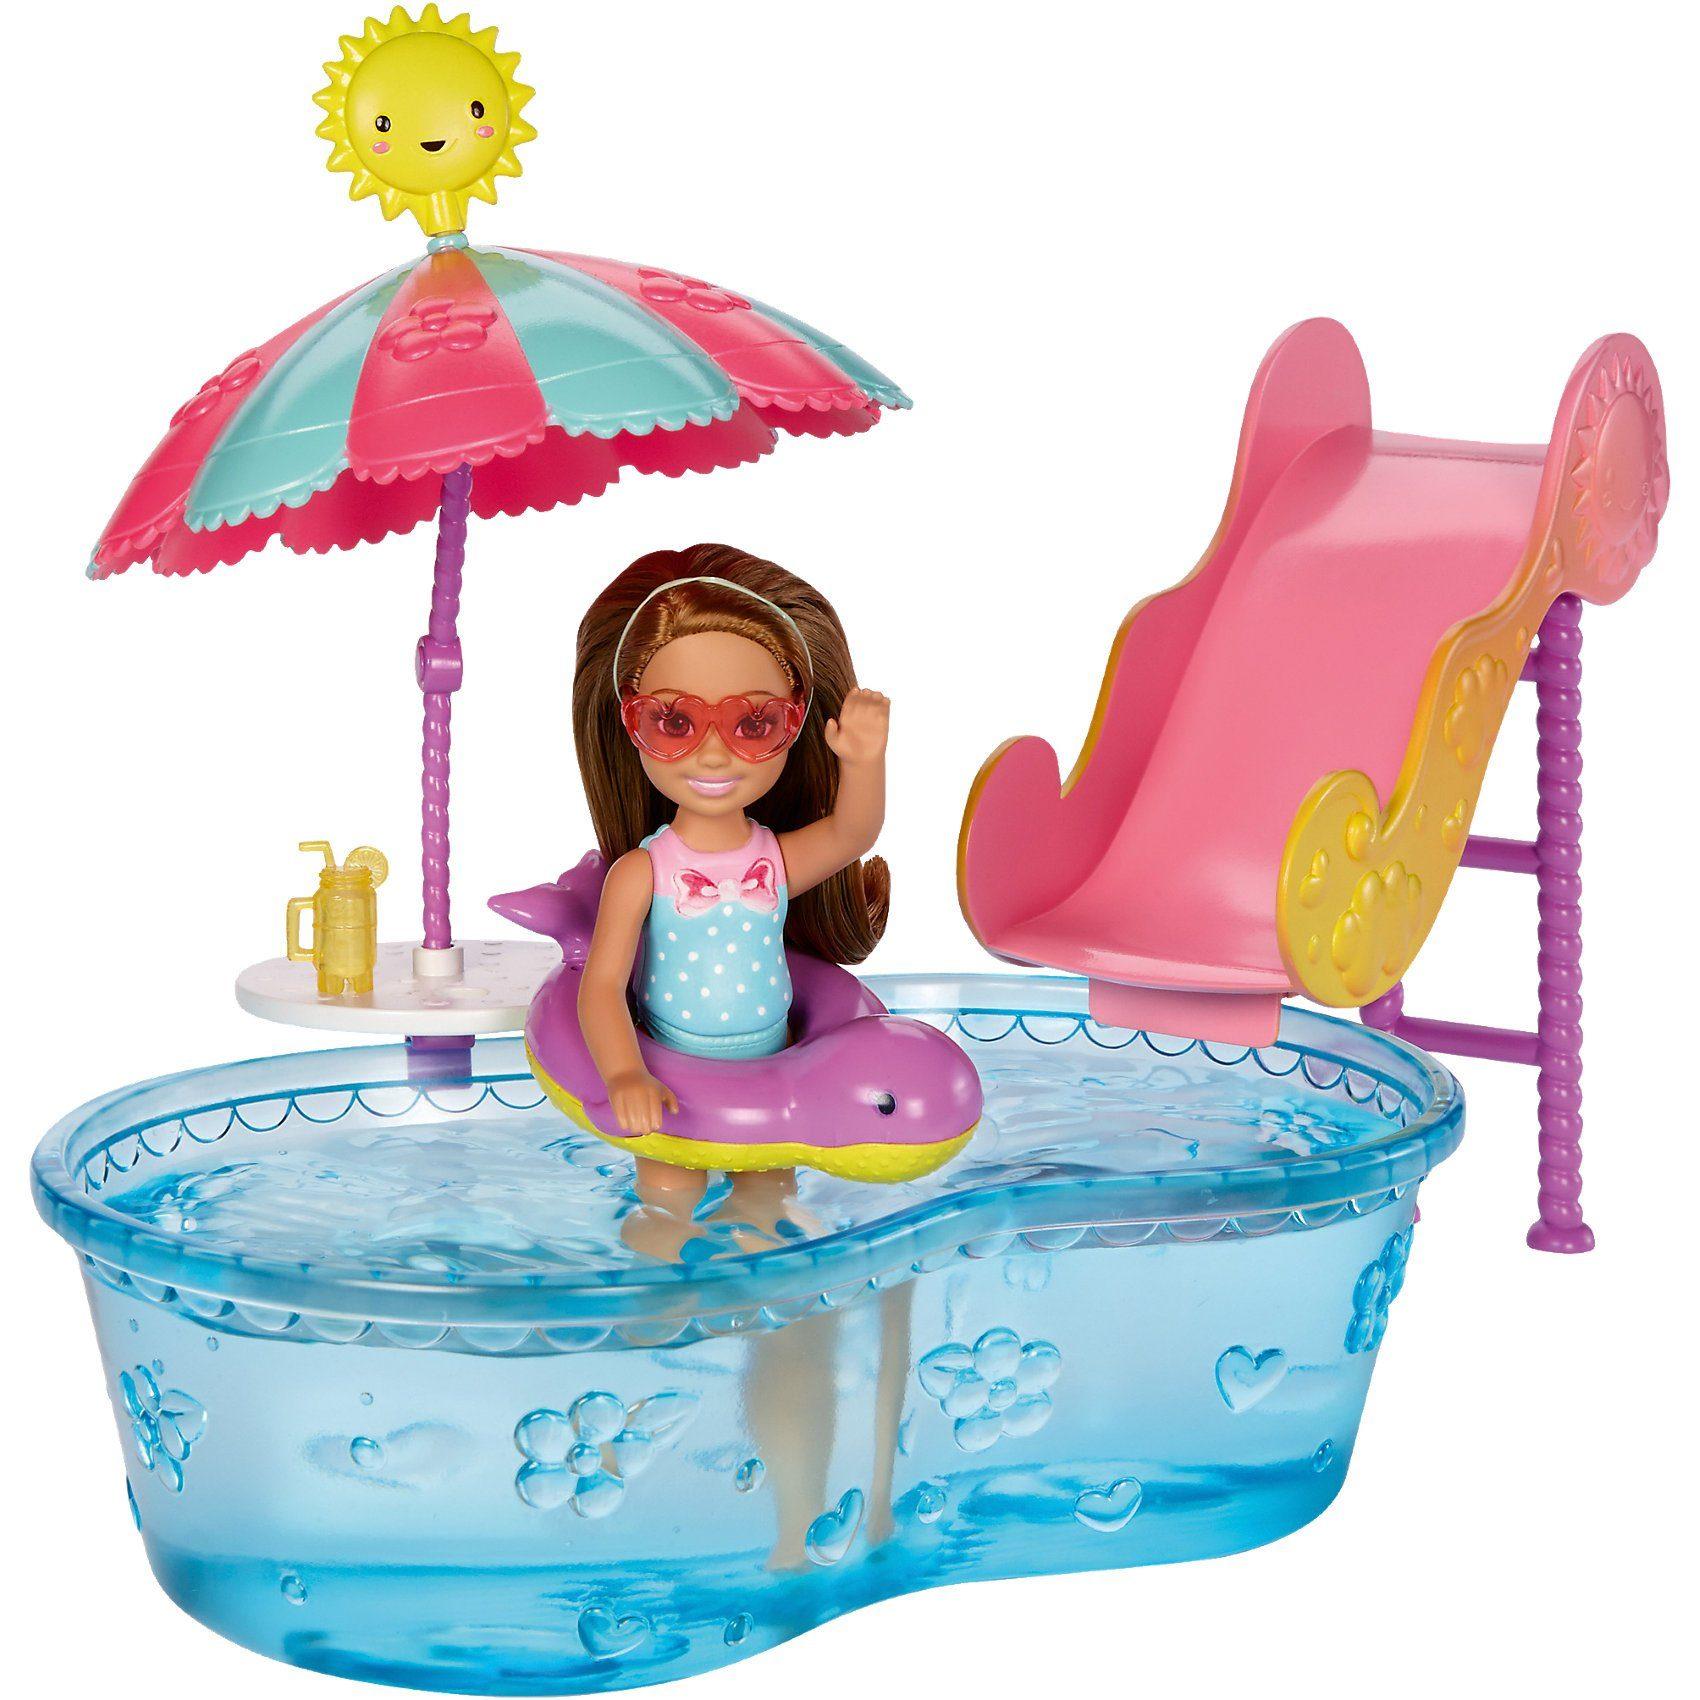 Mattel Chelsea Pool & Wasserrutsche Set